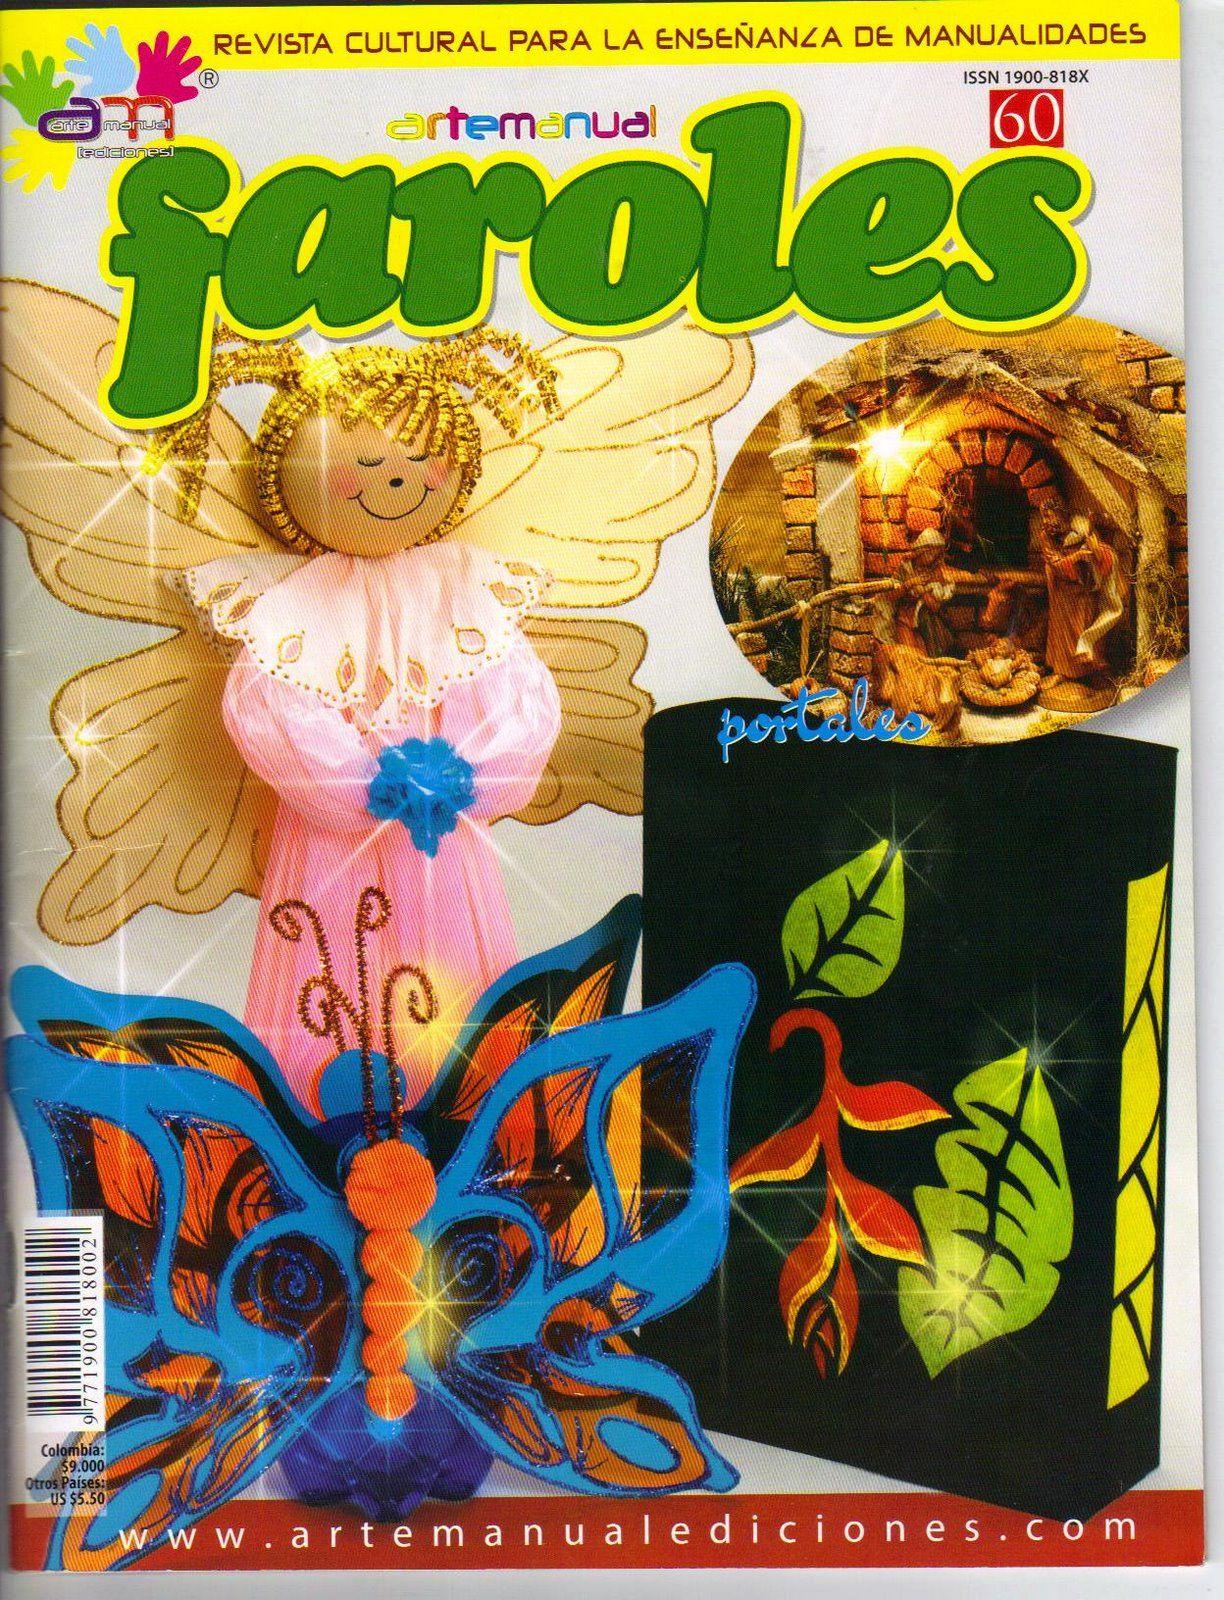 Revista: Arte Manual No. 60 [13 MB | JPG | Español]